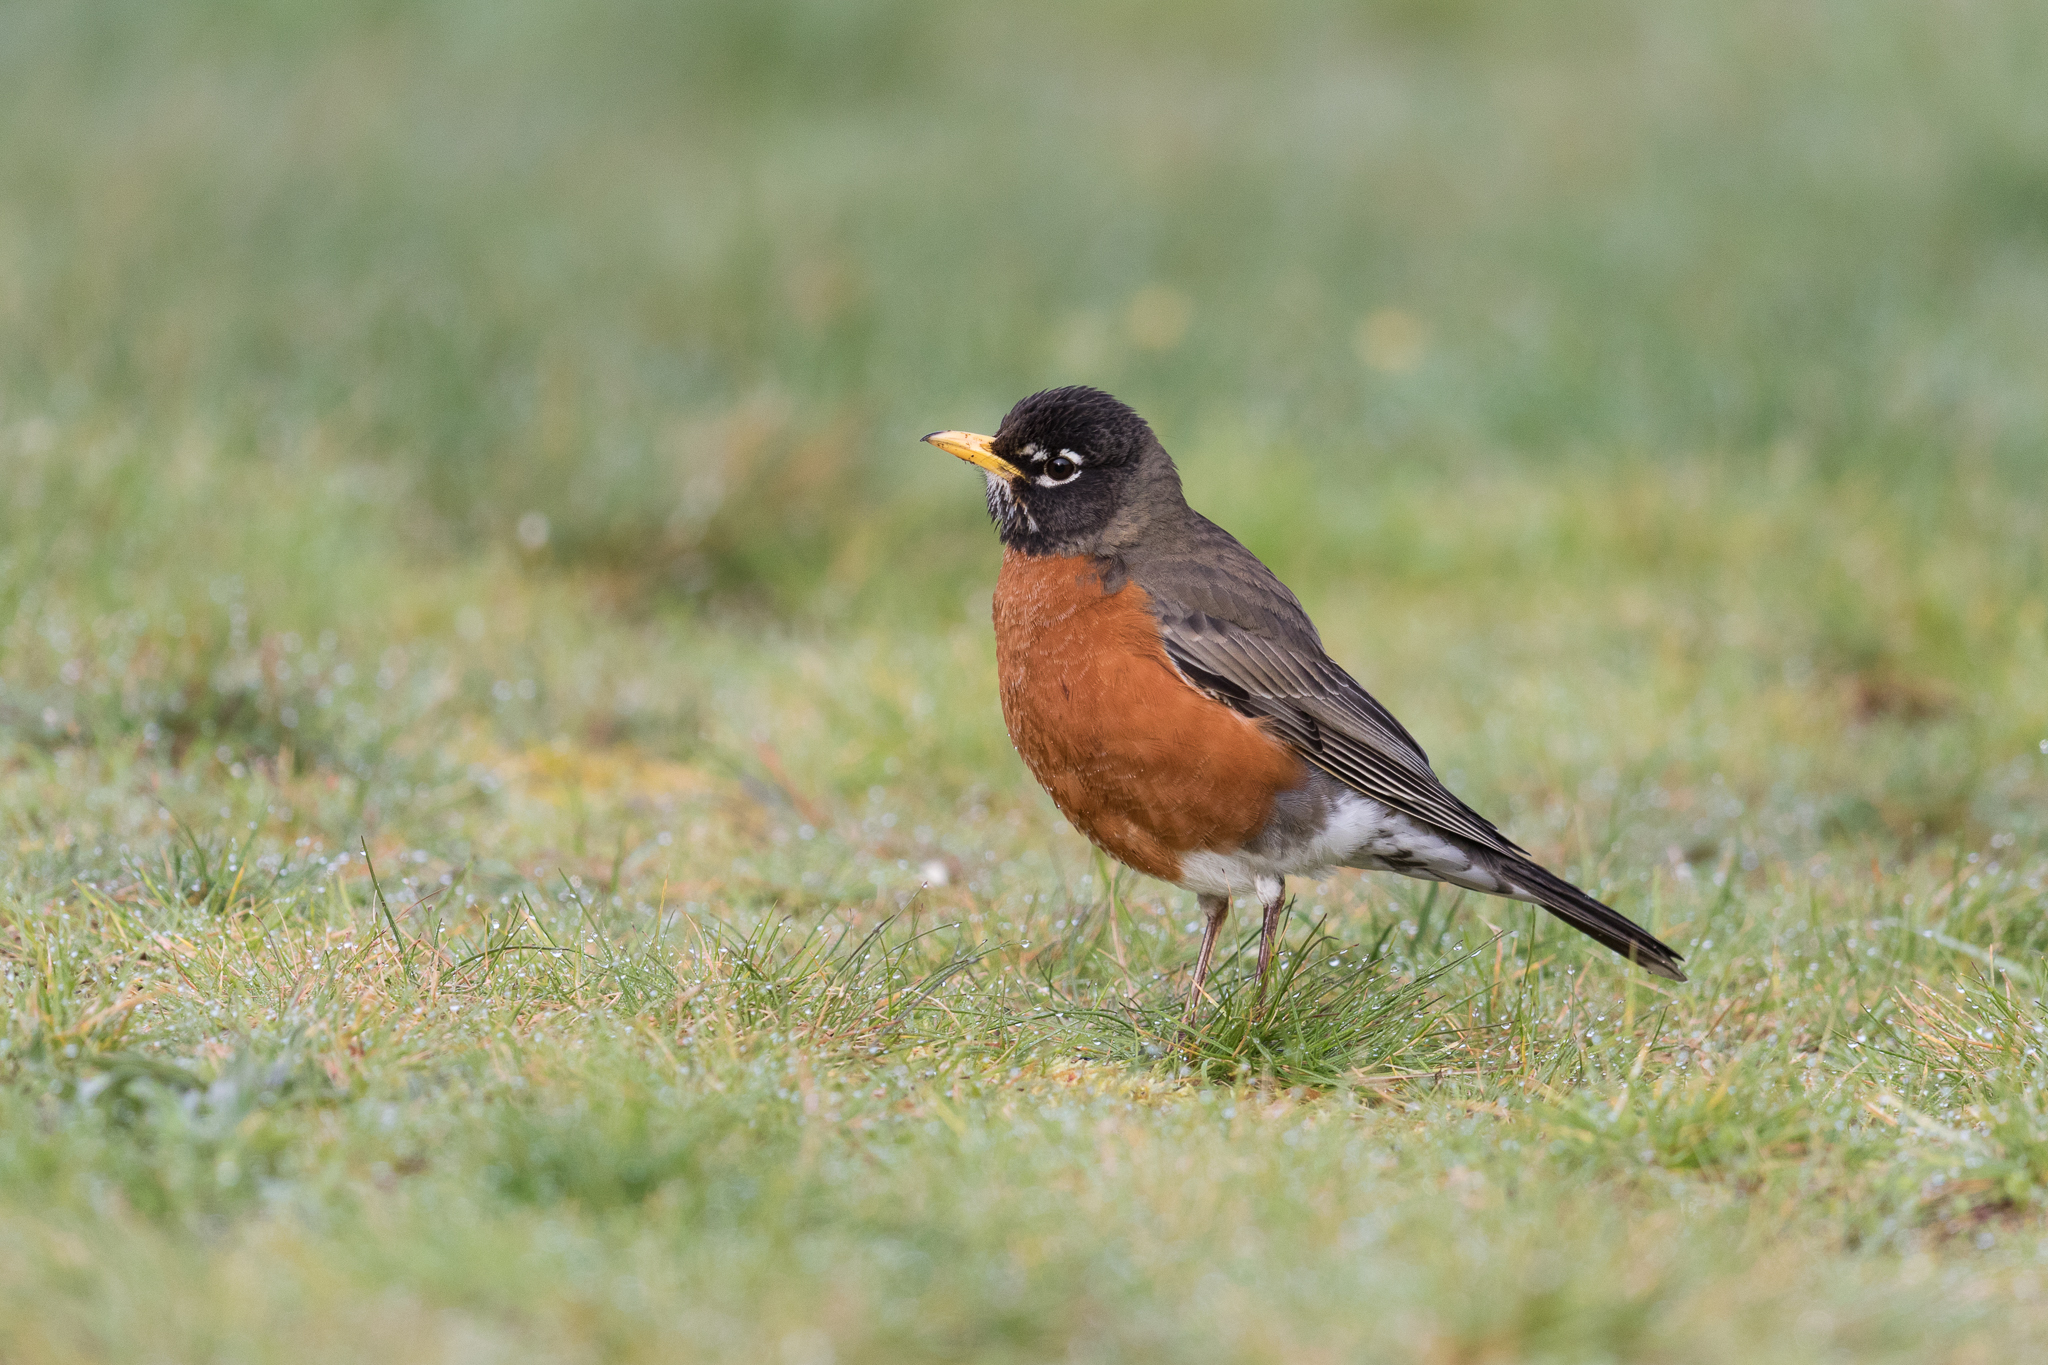 Photo: American Robin, by Tyler Hartje